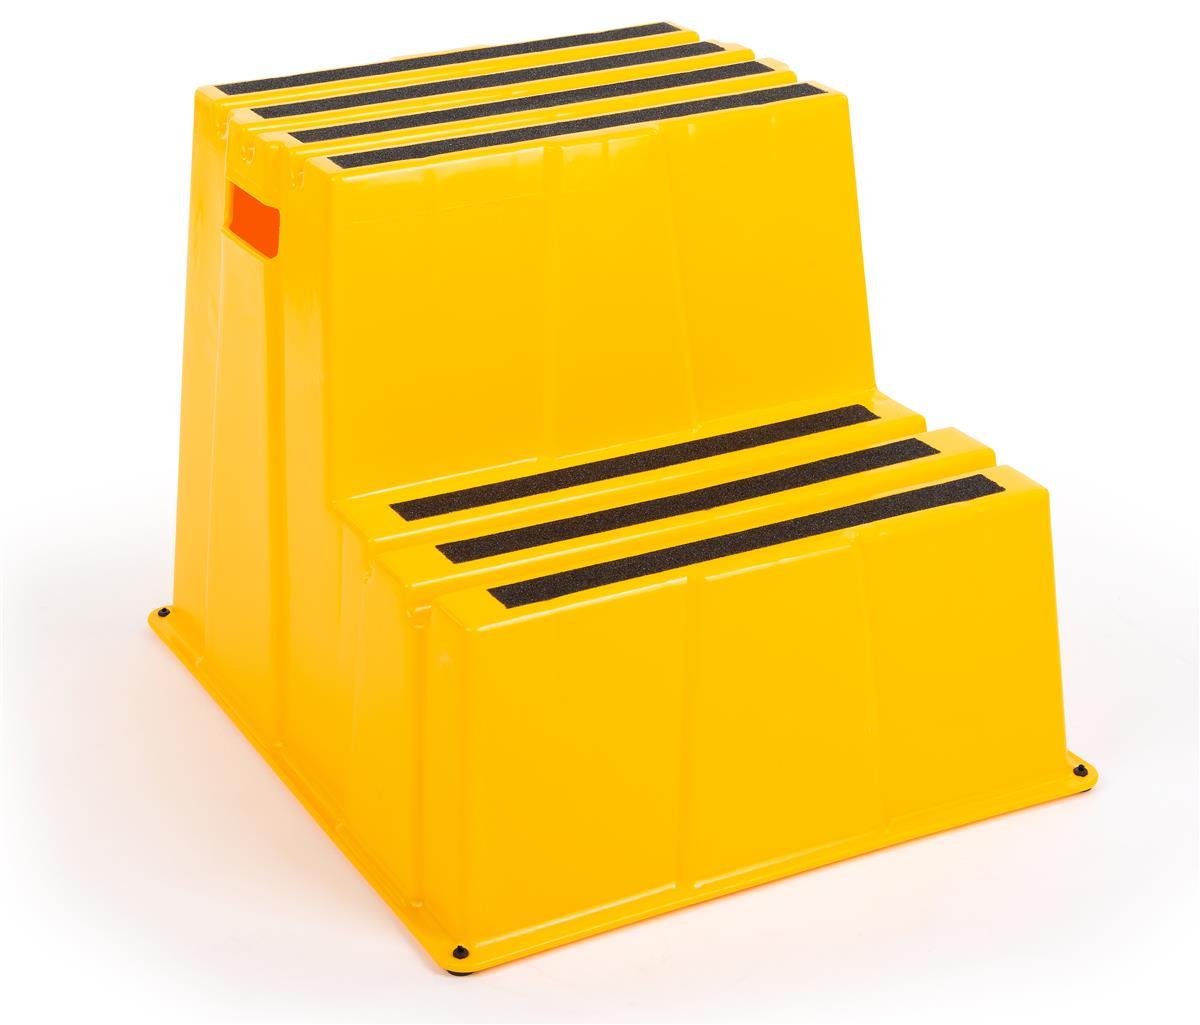 Miraculous 20H Step Stool 2 Tiers 500 Lb Capacity Yellow Evergreenethics Interior Chair Design Evergreenethicsorg